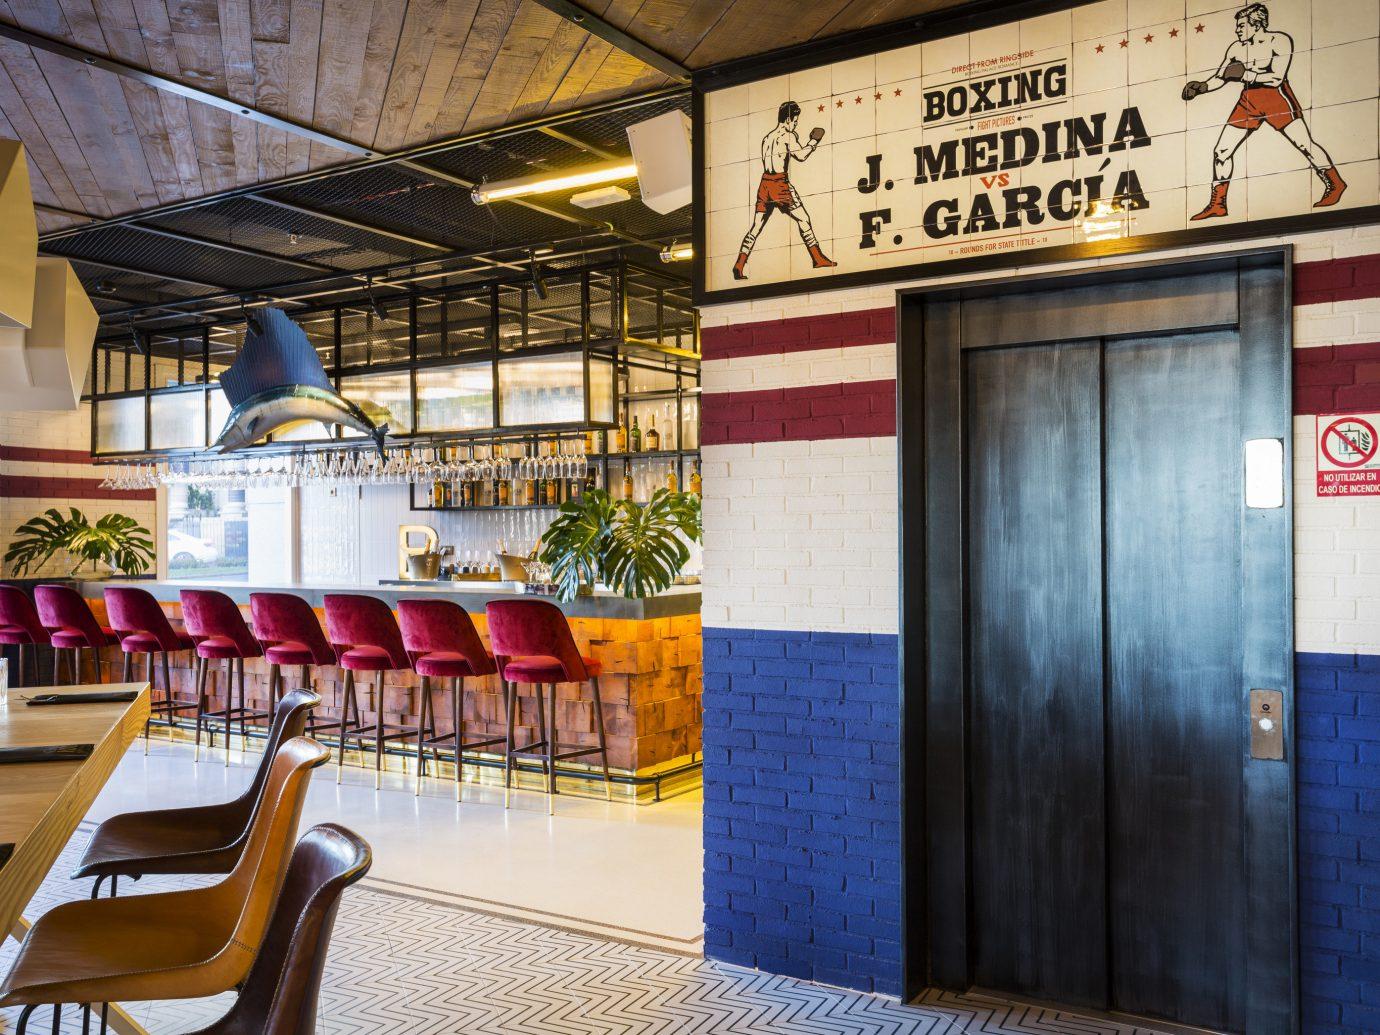 Hotels indoor restaurant interior design window covering area